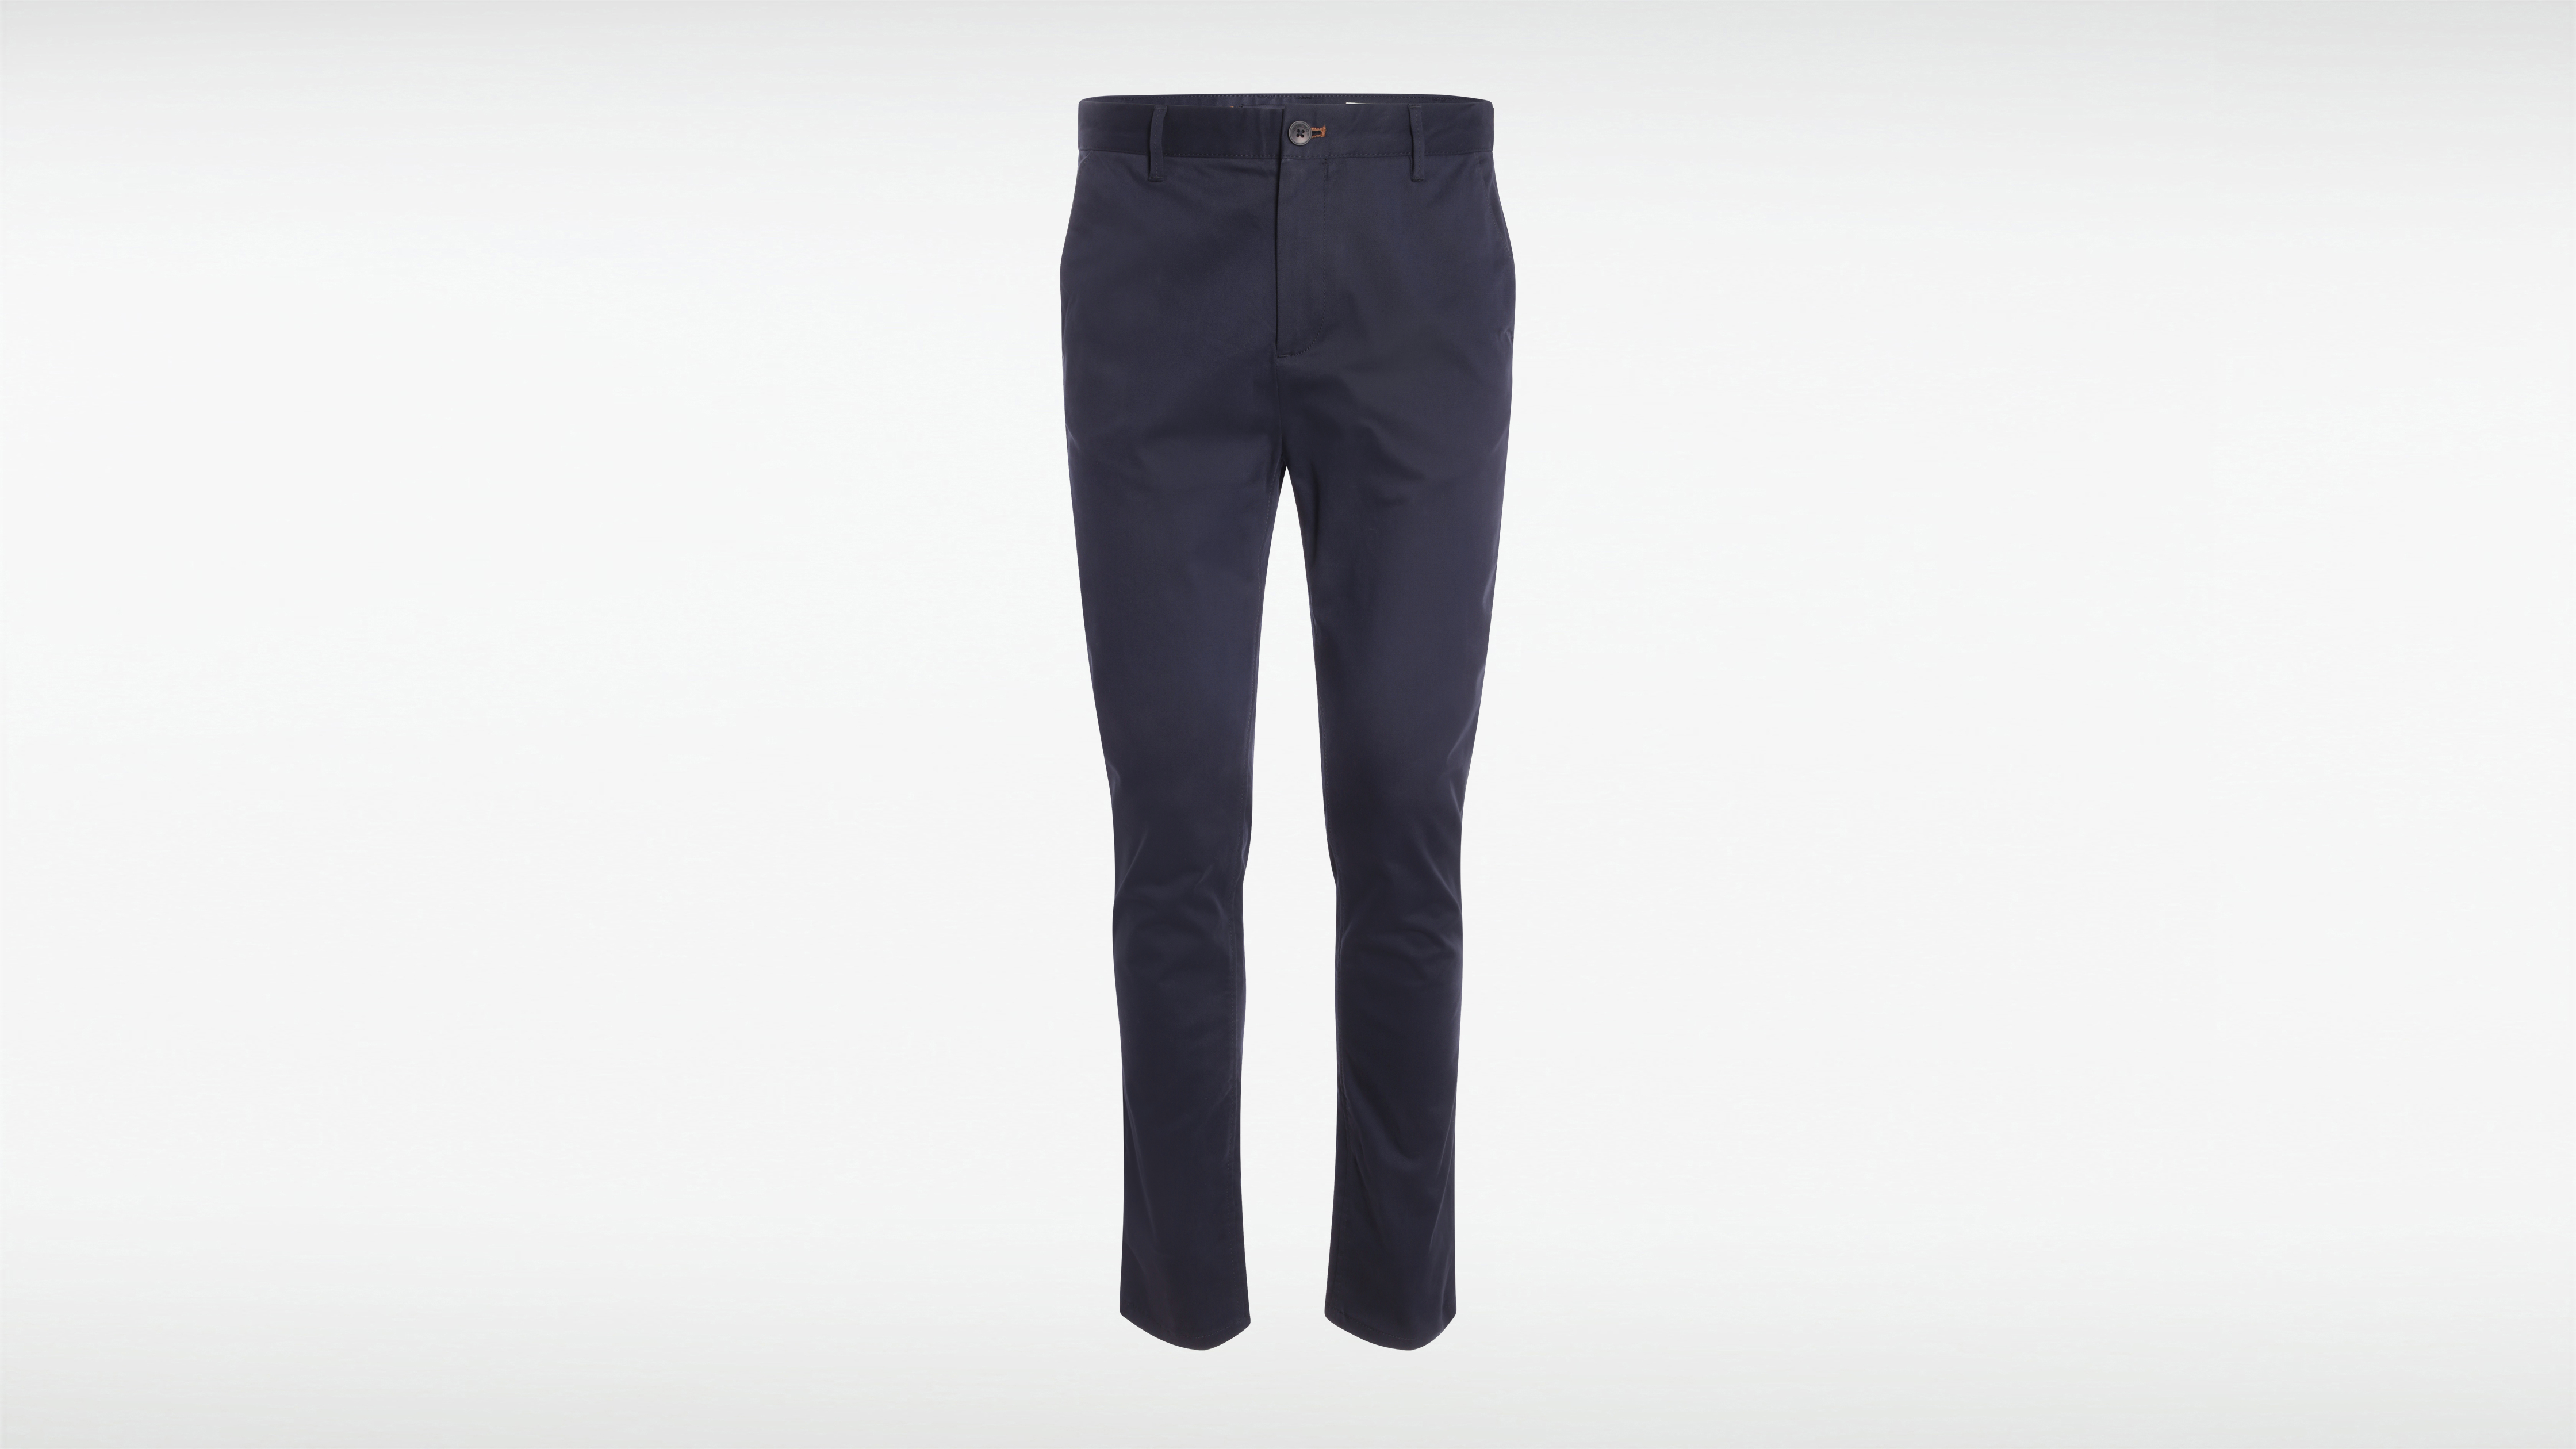 Pantalon Bleu Chino Homme Chics Détails Marine m8nN0w